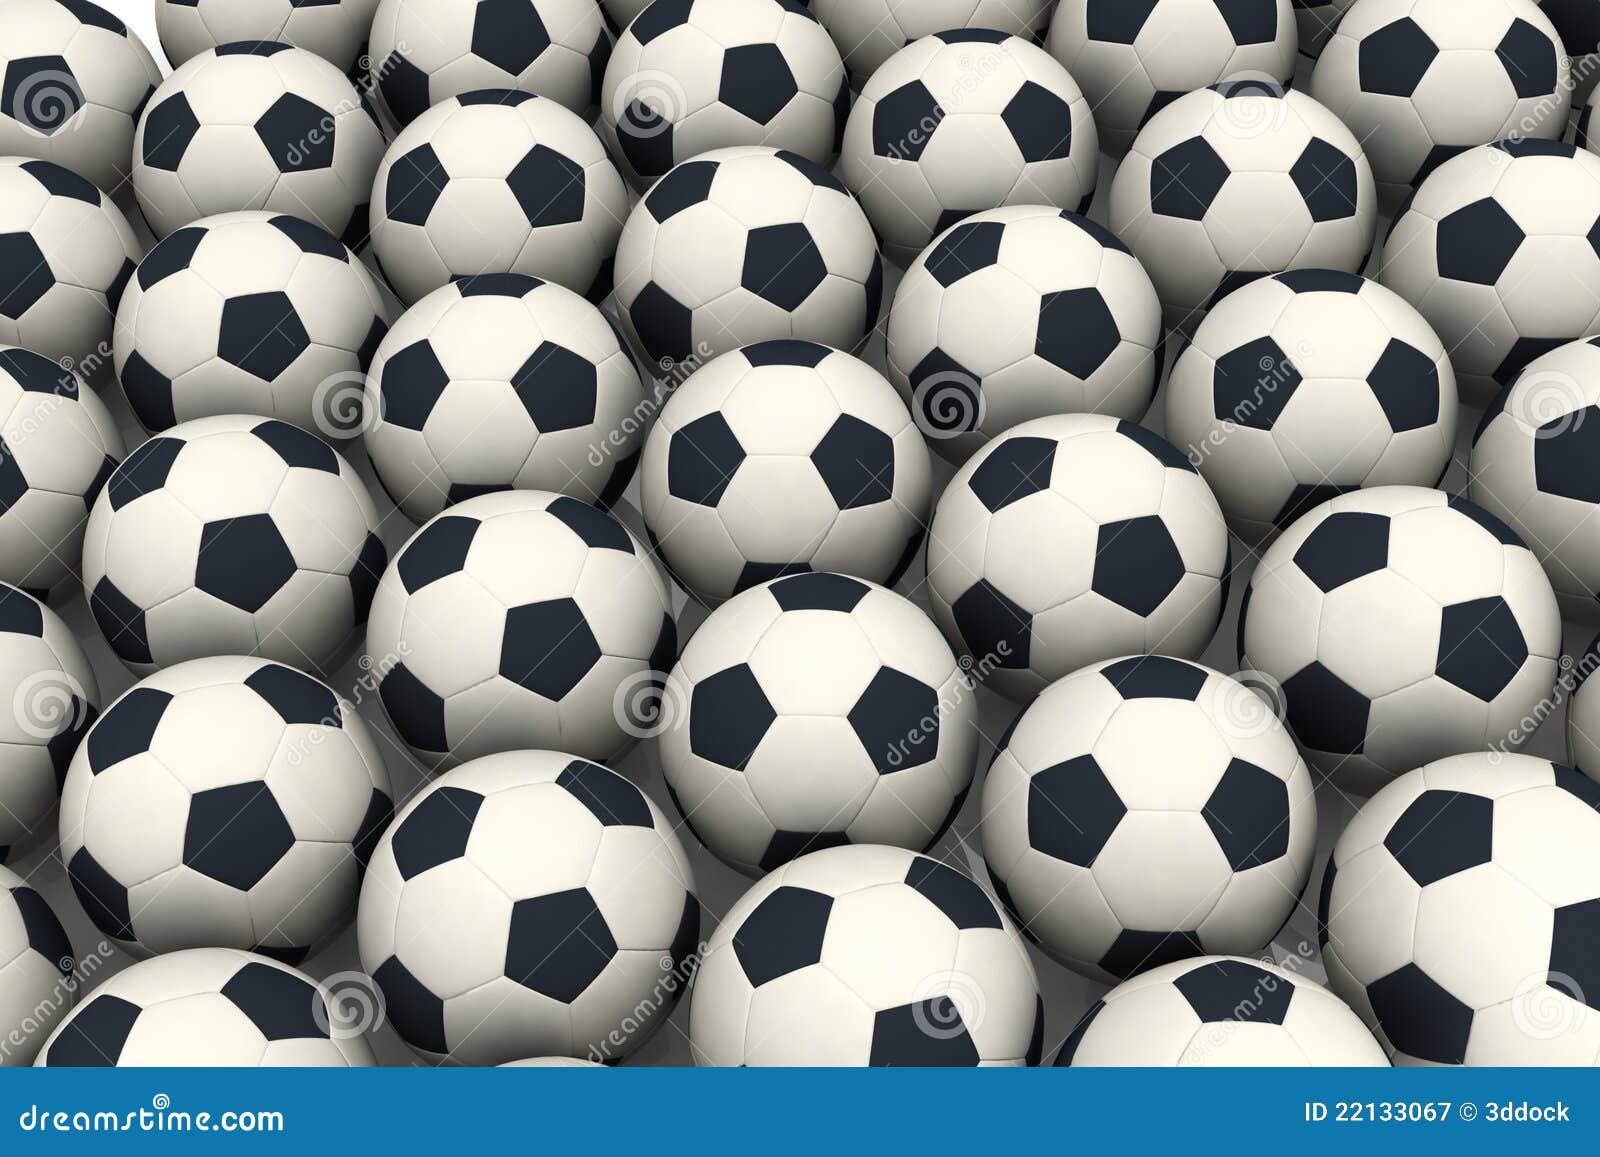 Soccer Balls Royalty Free Stock Photography - Image: 22133067